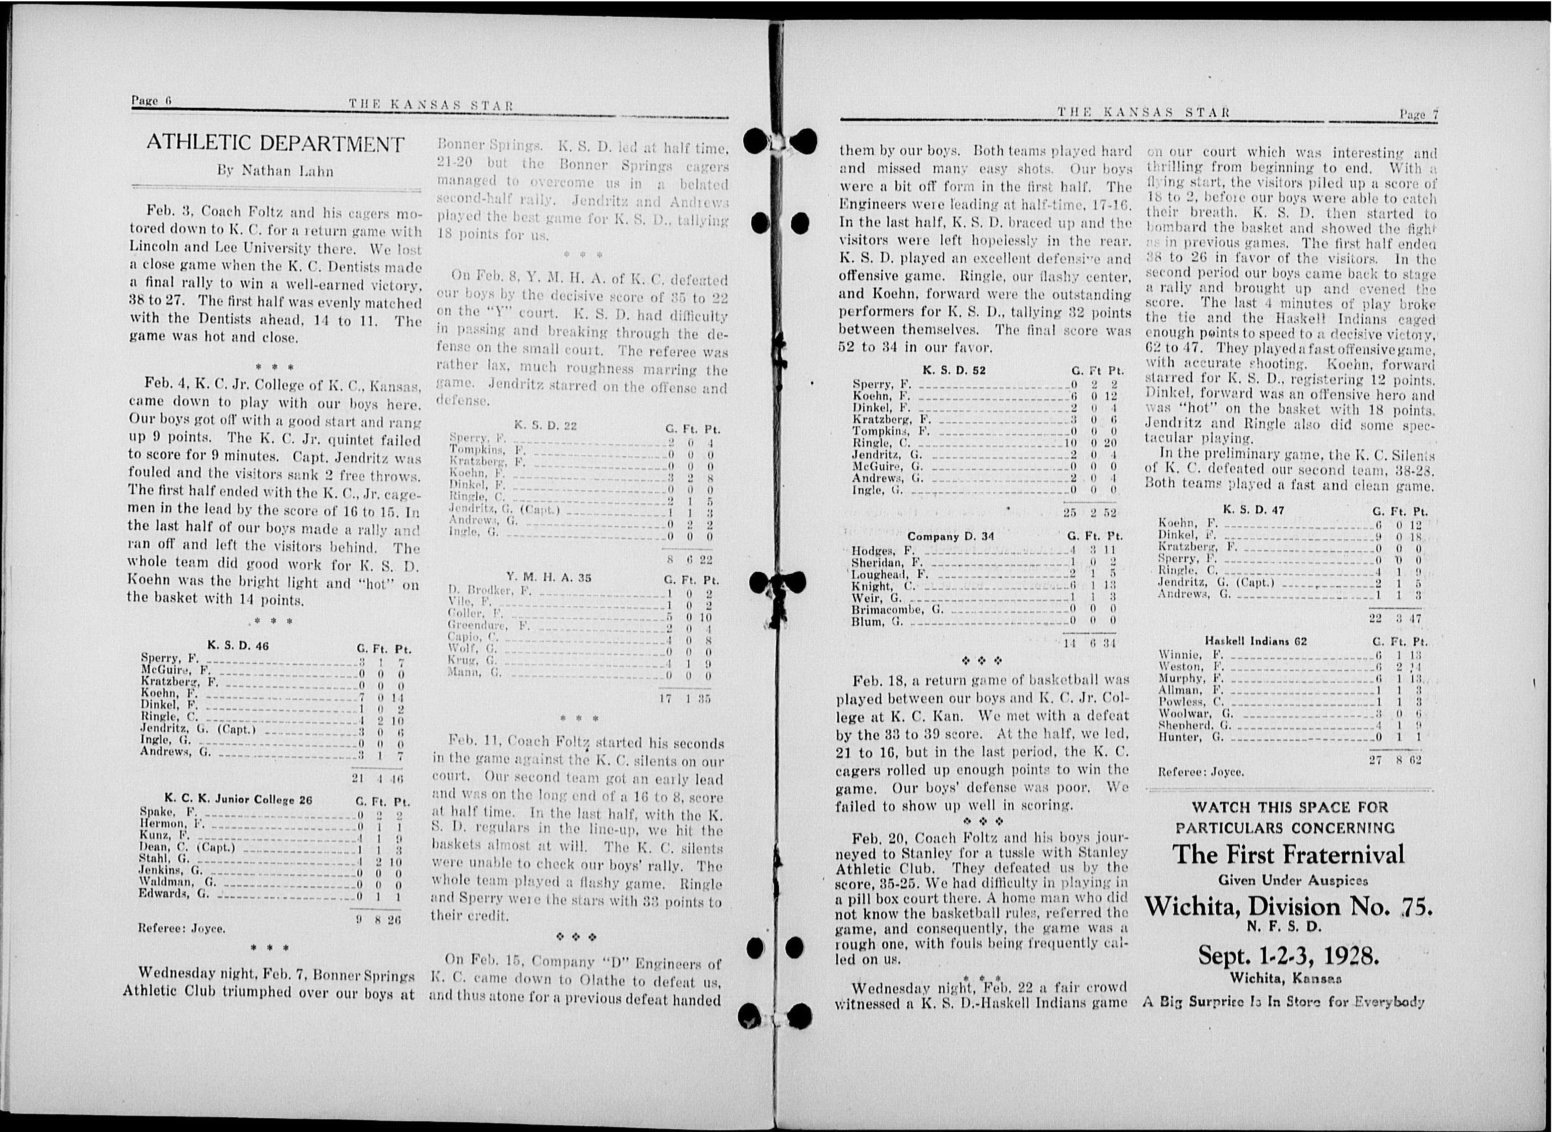 The Kansas Star, volume 51, number 8 - 6-7